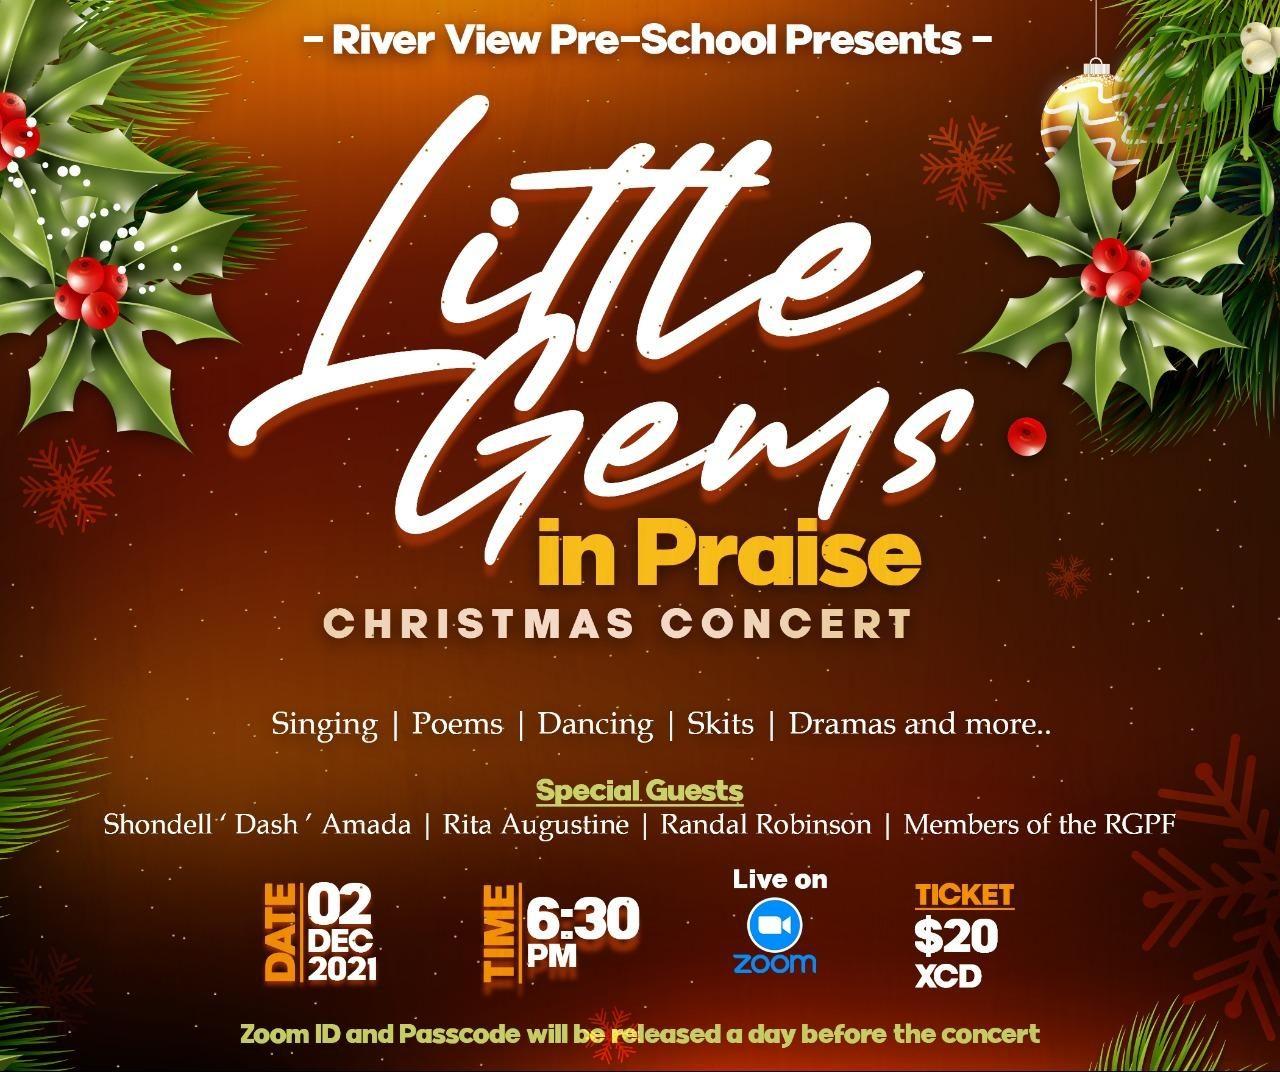 Little Gems in Praise Virtual Christmas Concert Dec 2nd